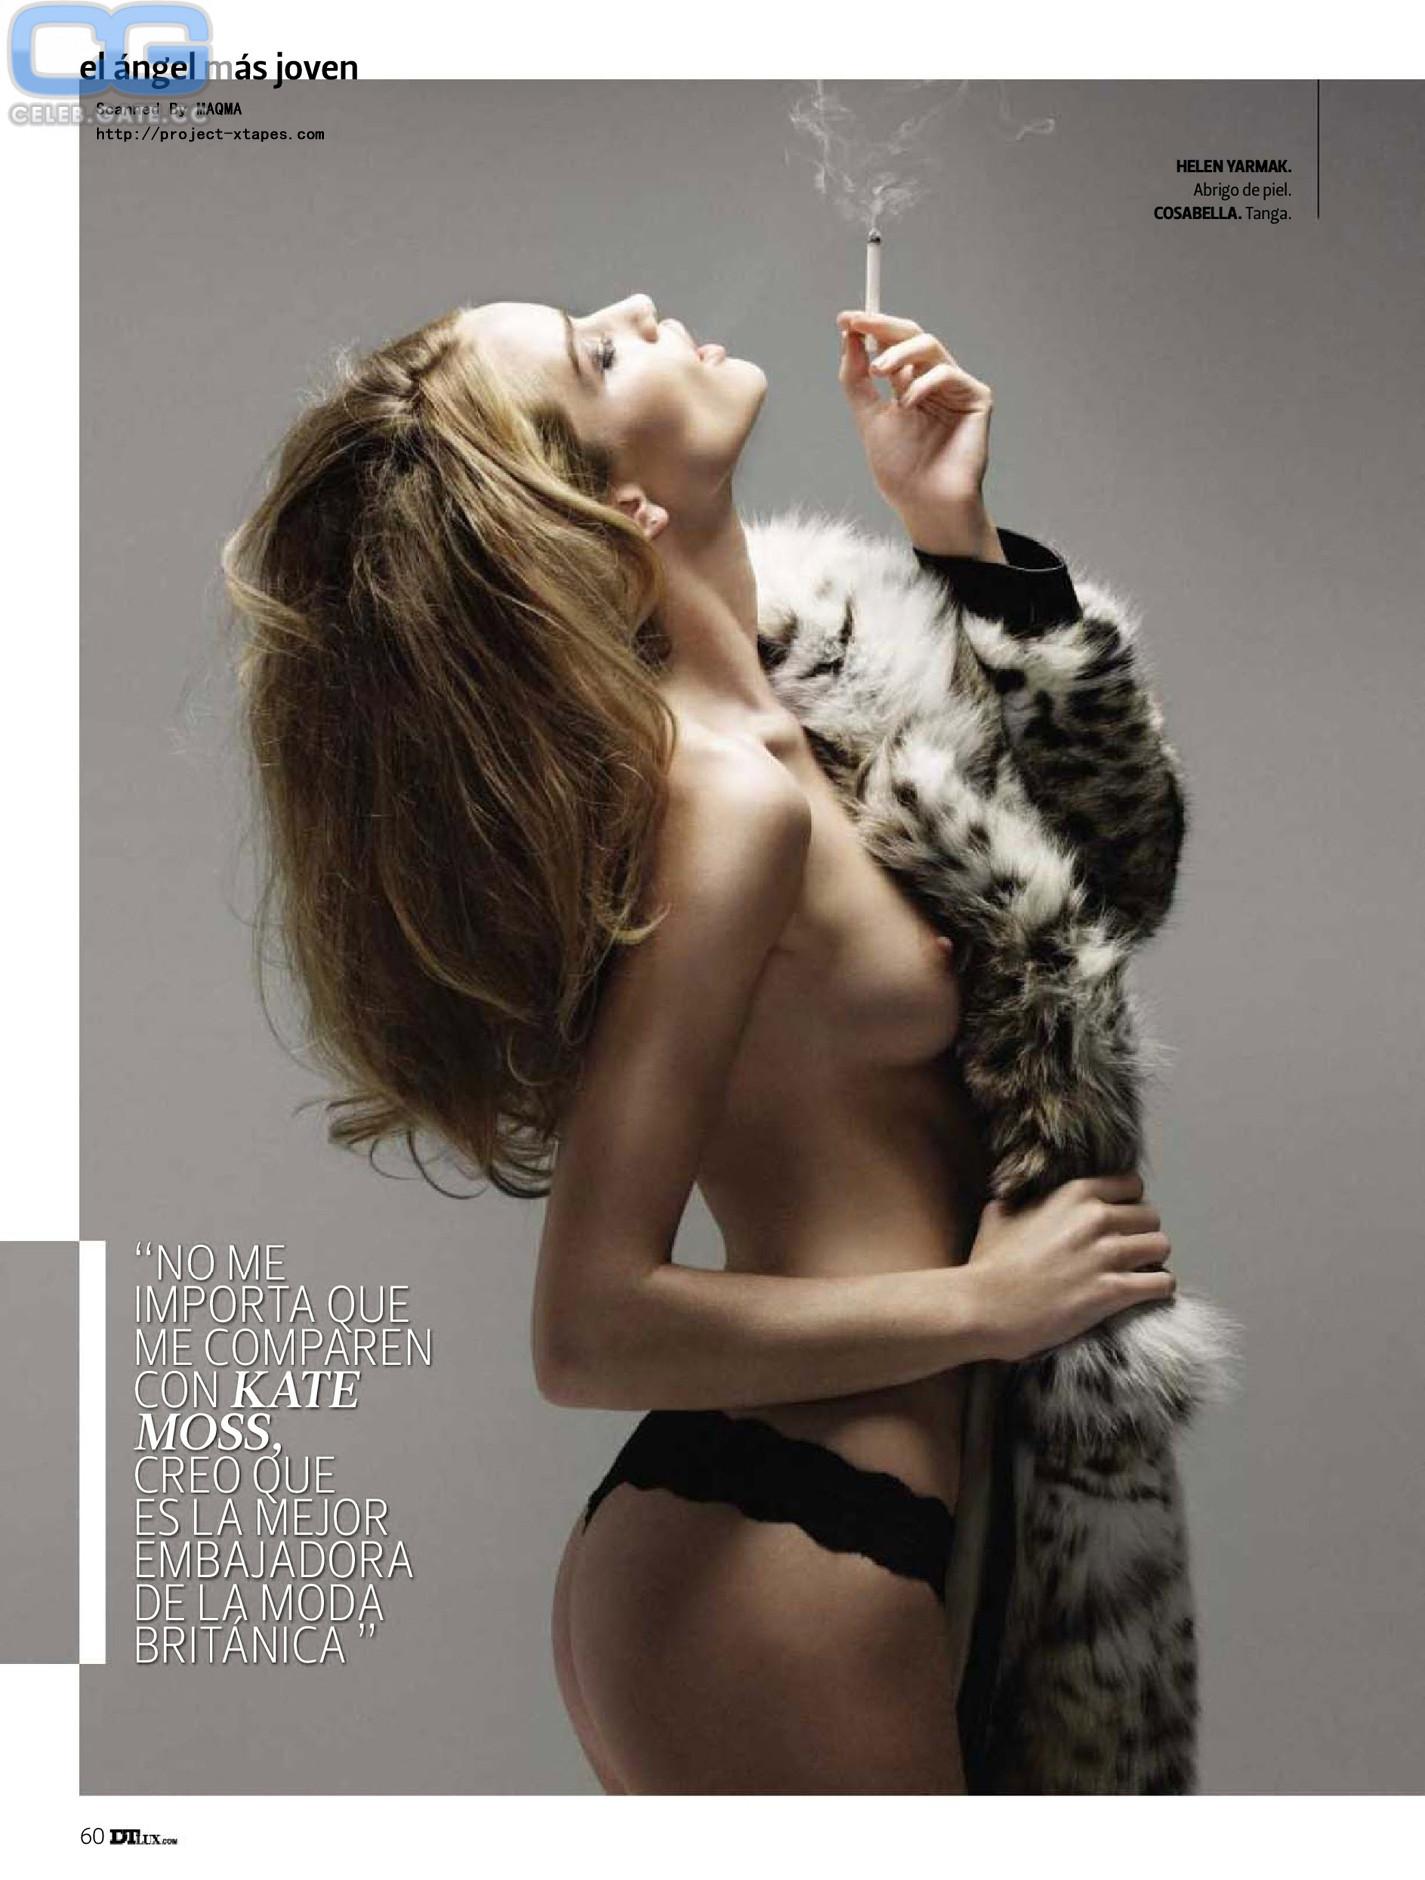 huntington-whiteley nudes Rosie